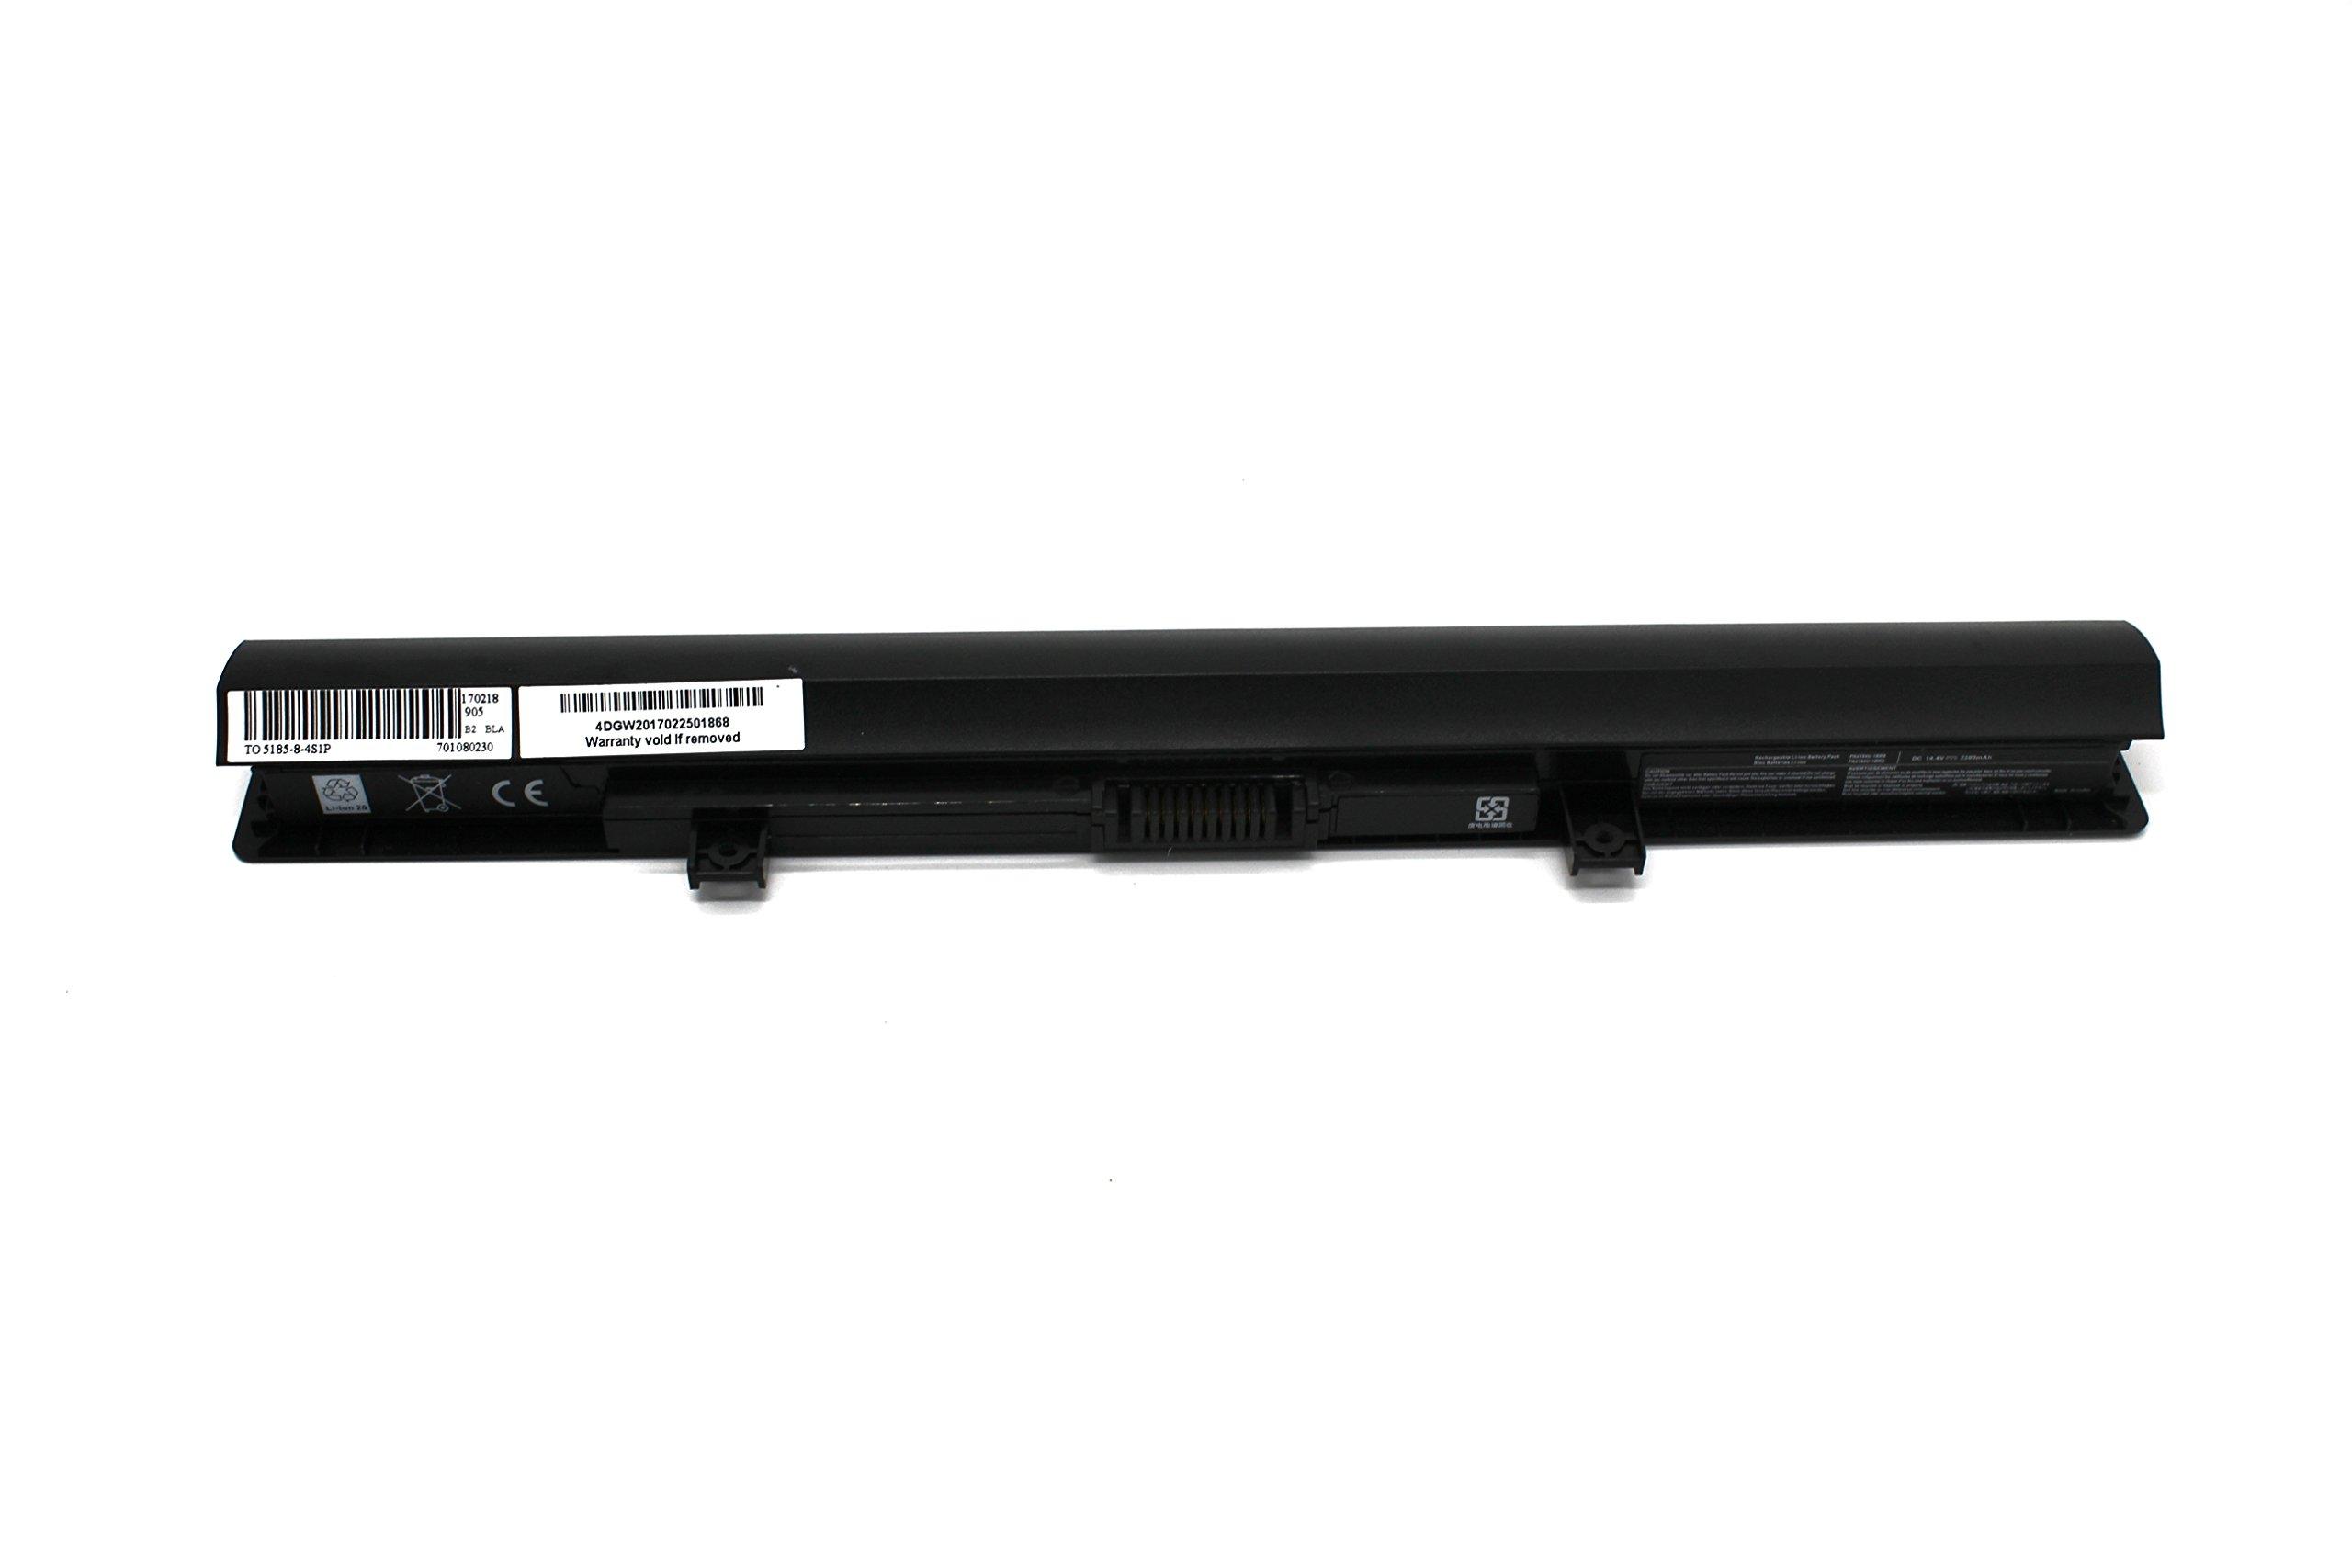 4d Laptop Battery for Toshiba PA5185U-1BRS PA5186U-1BRS Satellite C50 C55D L55,Satellite C Series C50-B,C50T-B, C50D-B,C55D-B L55D,C55T-B C55T-B5109,L55 C55T-B5110,L55-B5276,L55 -B (B0713PXVXL) Amazon Price History, Amazon Price Tracker